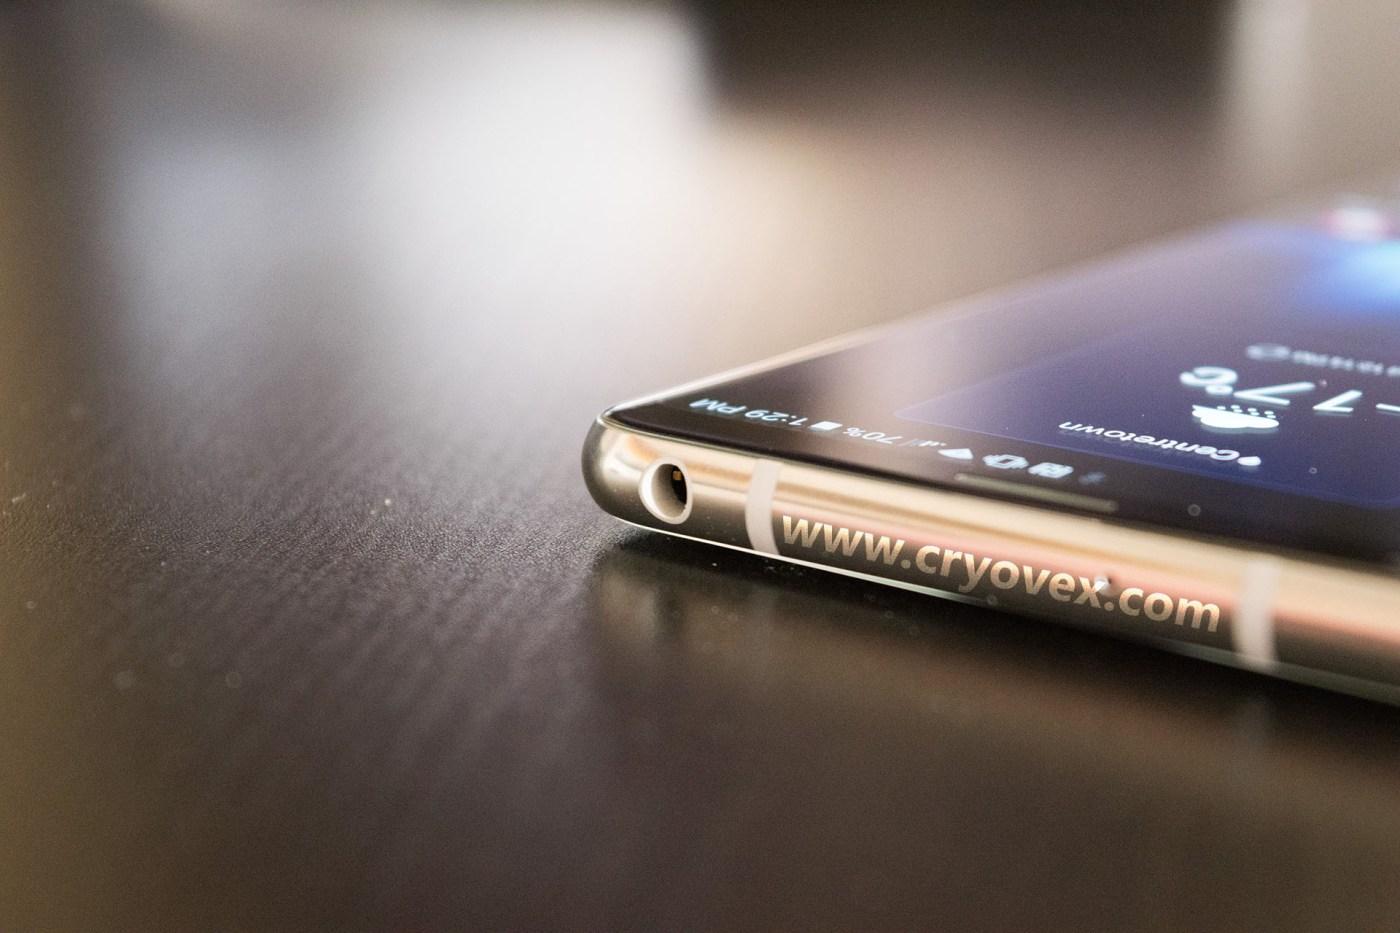 LG V30 Audio Jack DAC Cryovex Martin Android Ottawa Design 2